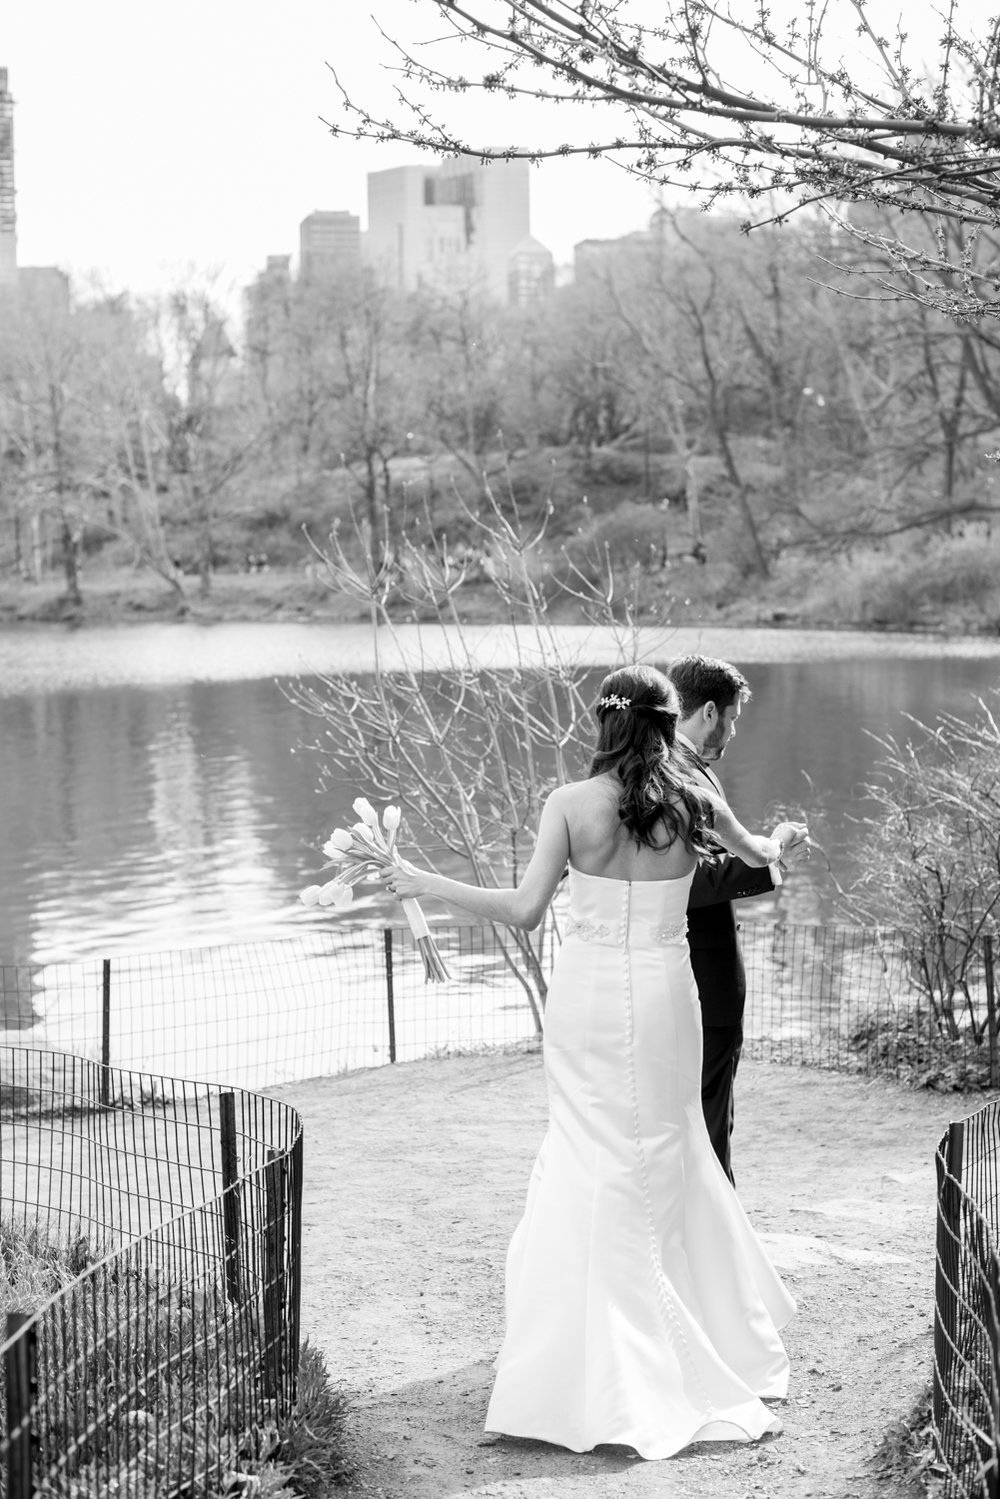 Anahi+David- Central Park Elopement- New York City- Olivia Christina Photo (222).JPG